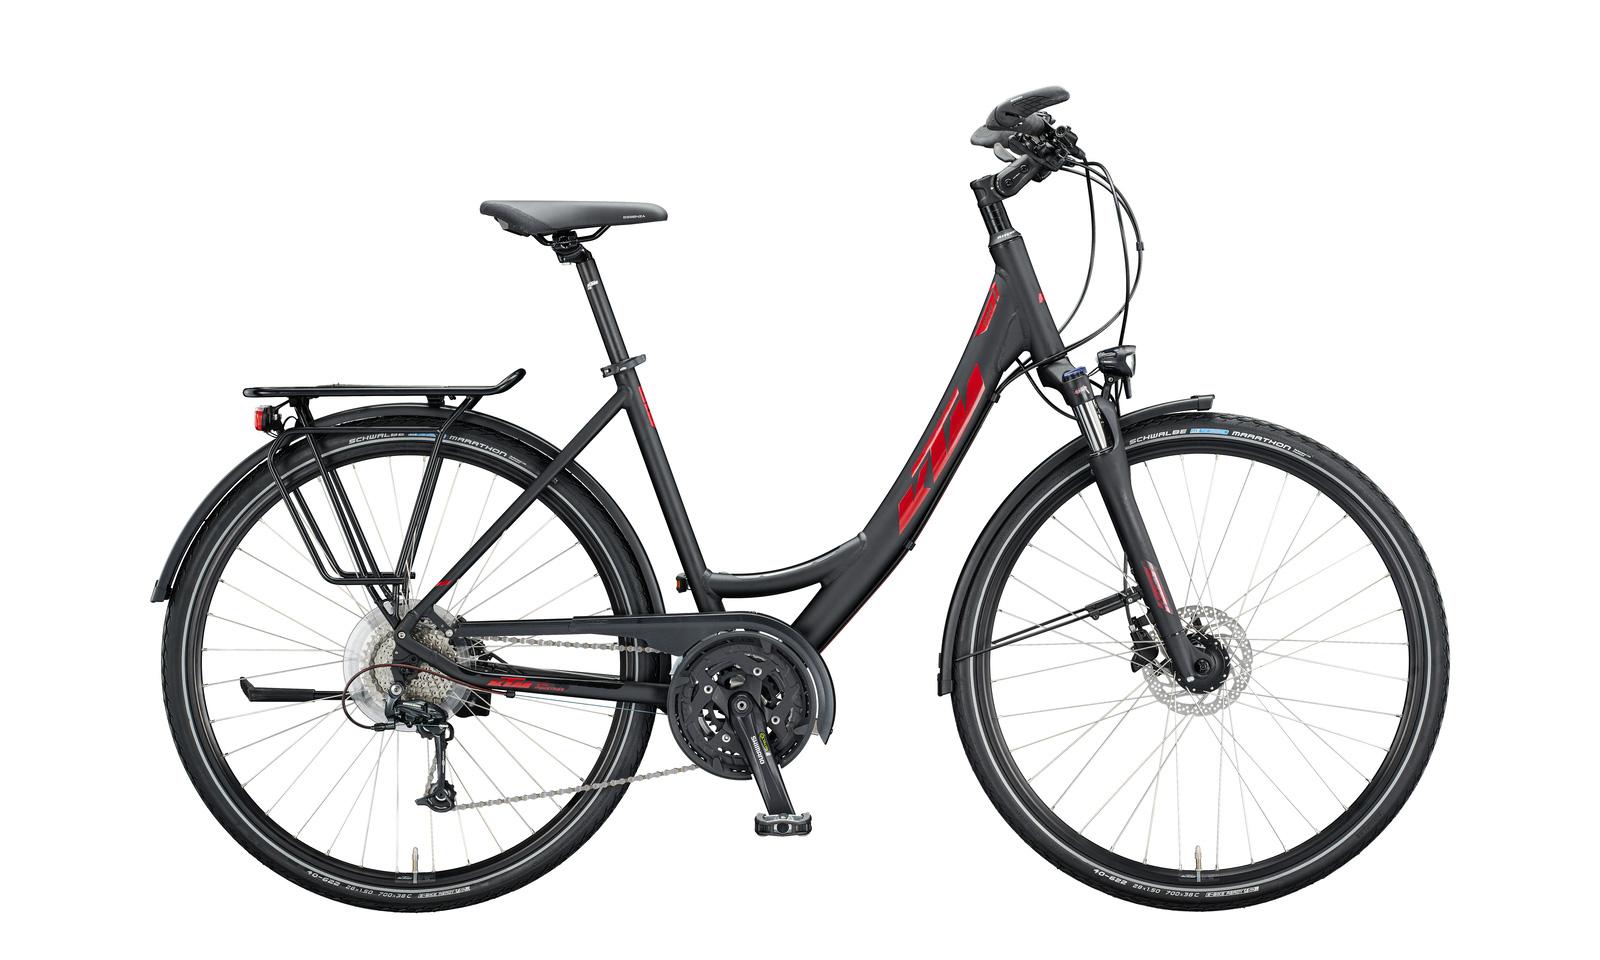 Biciclete KTM Trekking Onroad LIFE SPACE 3x9 Shimano Deore